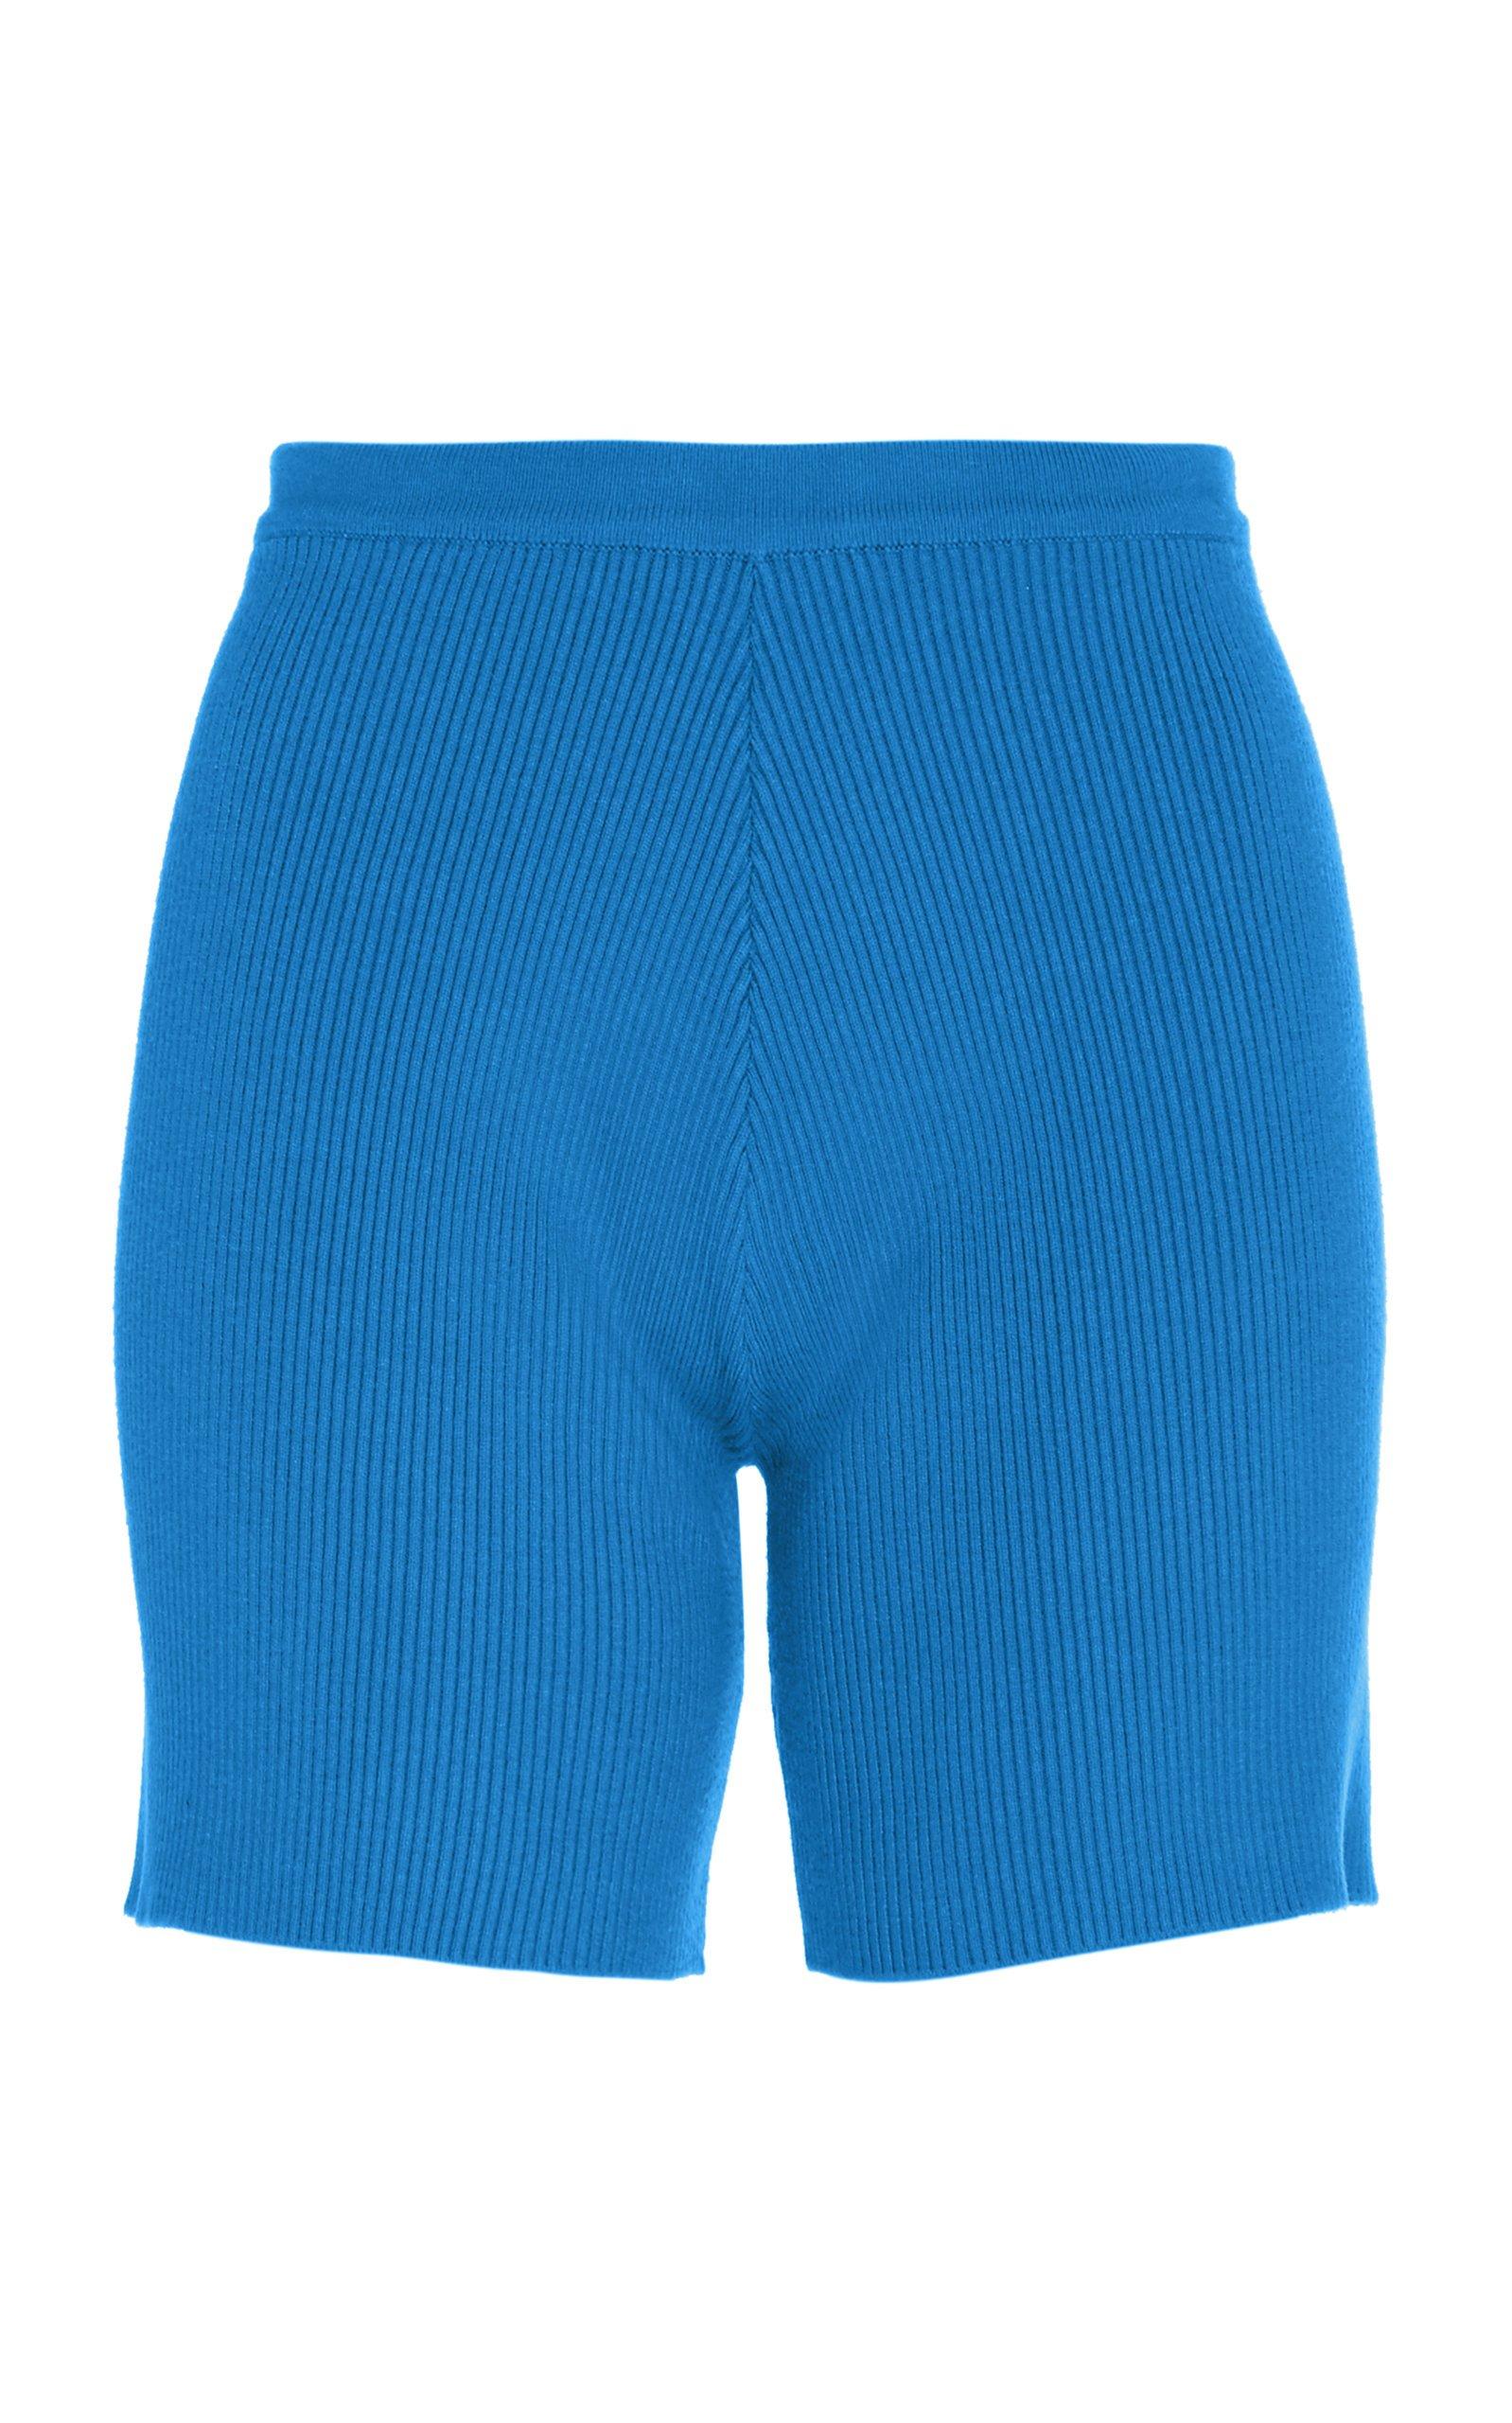 Apparis Penny Colored Biker Shorts Size: XS